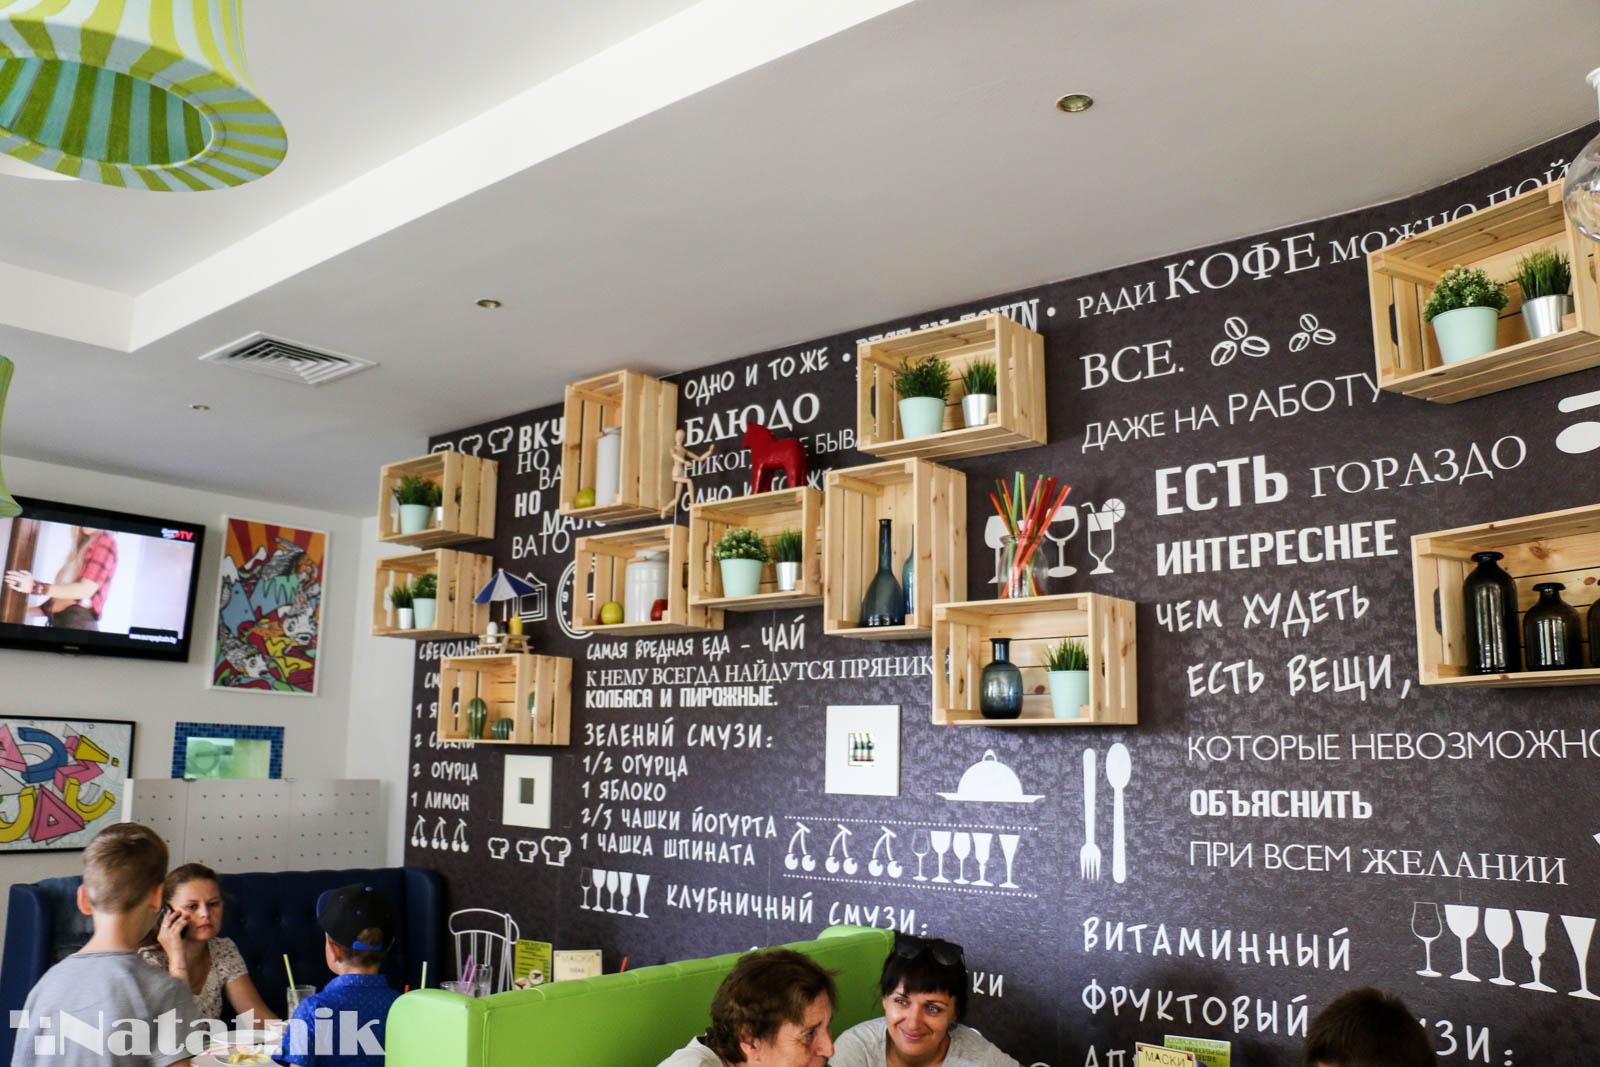 Берёза, парк, кафе Маски, еда